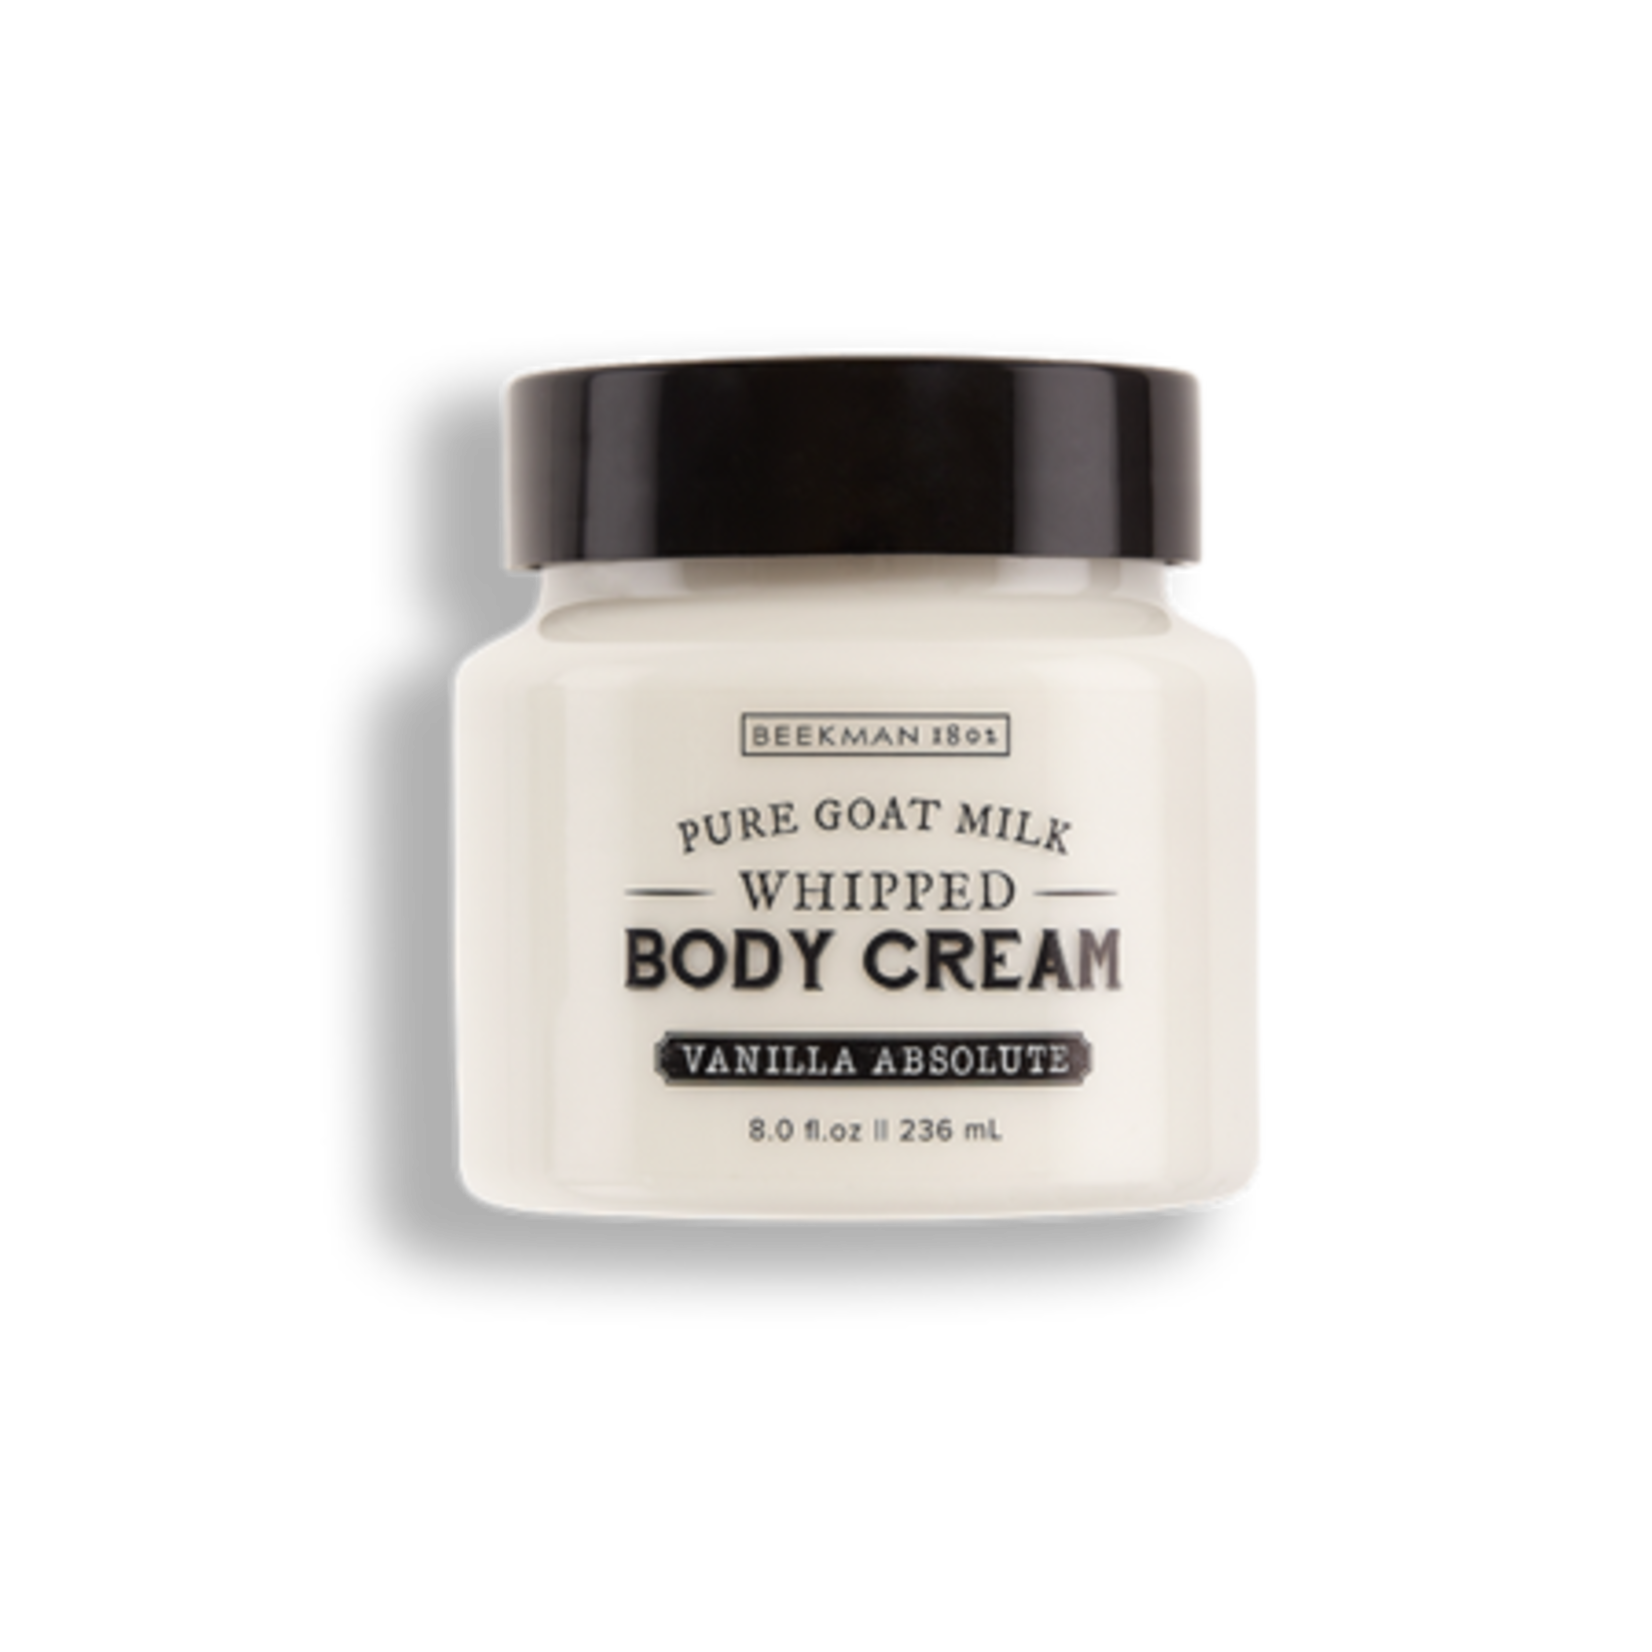 BEEKMAN 1802 Vanilla Absolute Whipped Body Cream